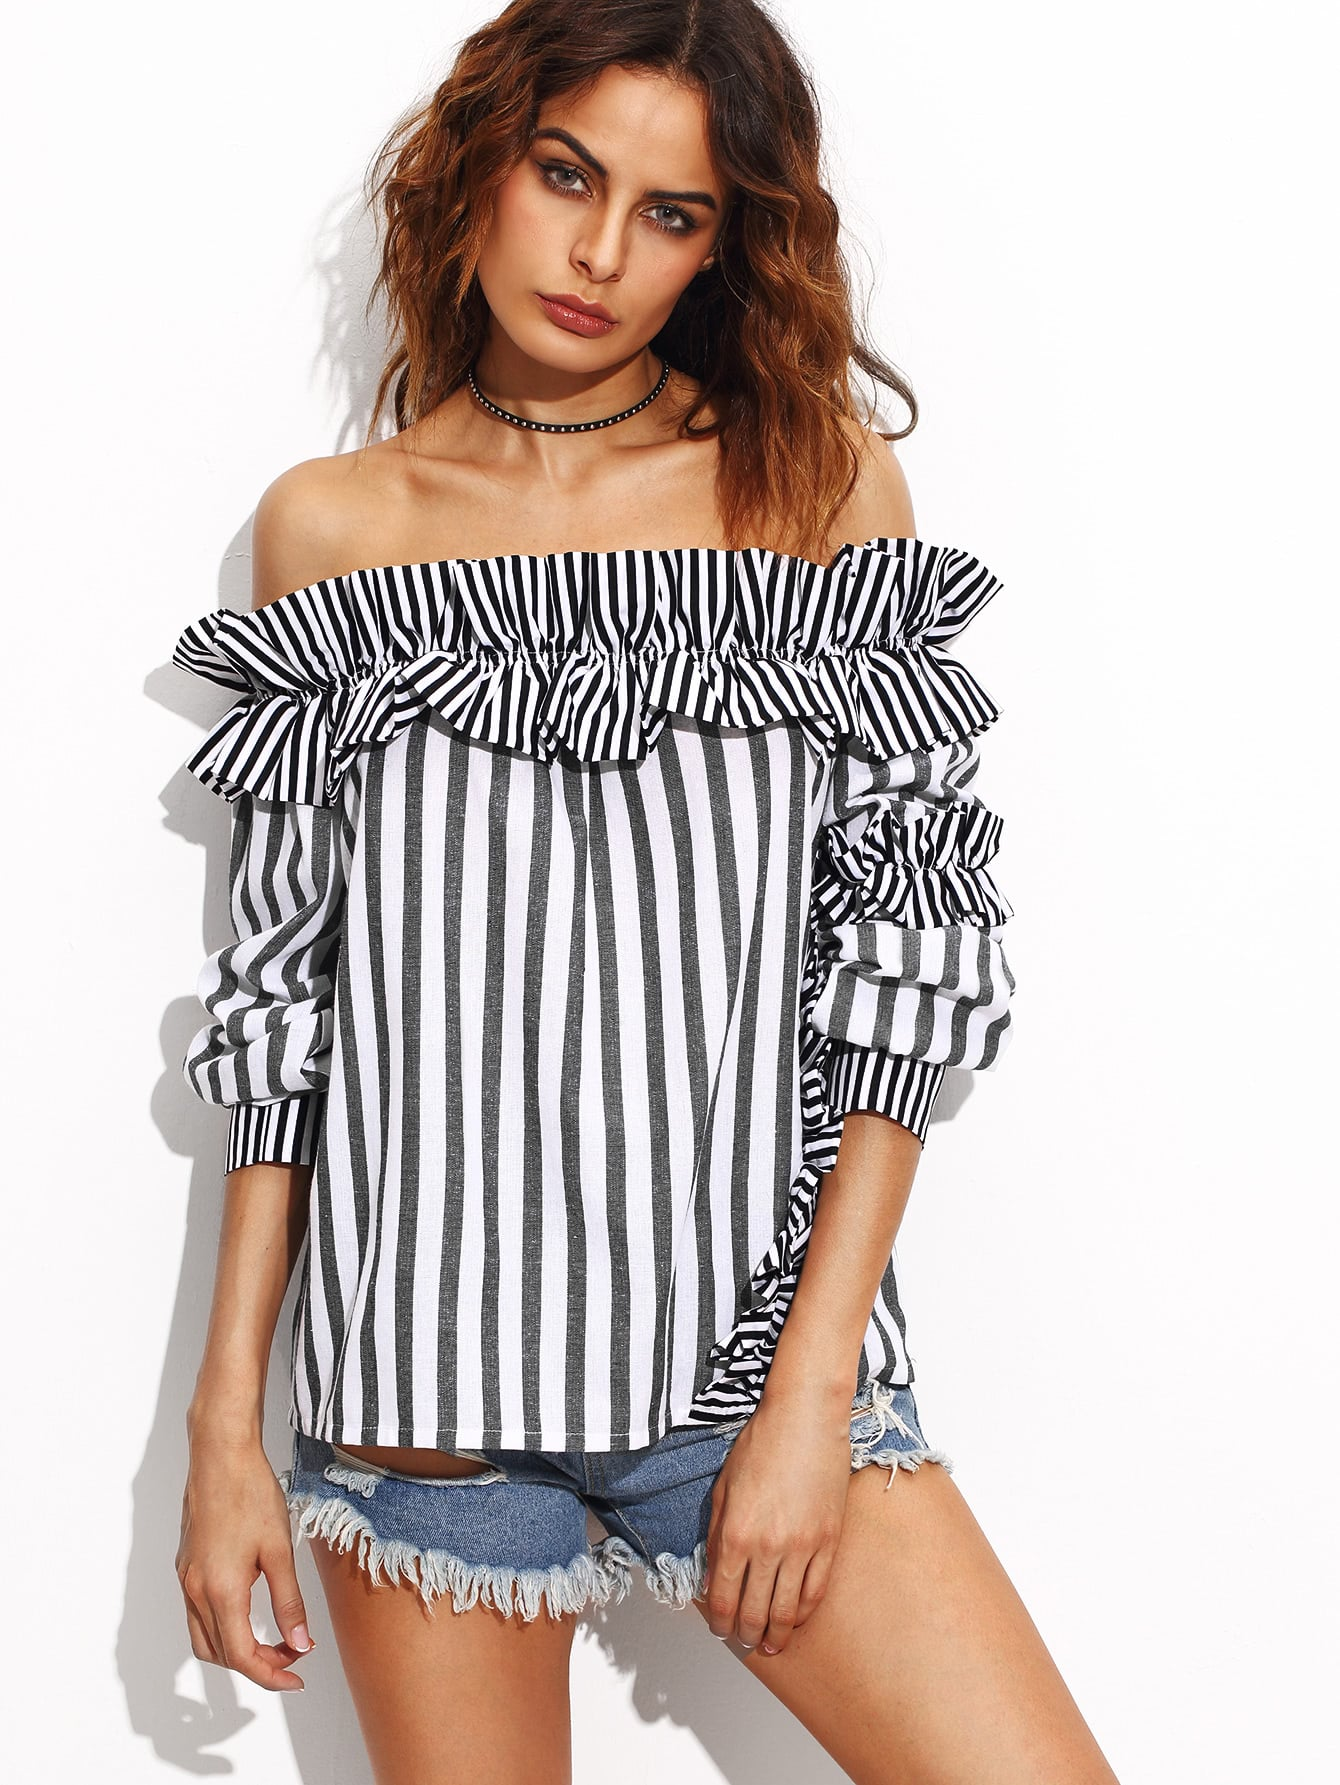 blouse161118702_1